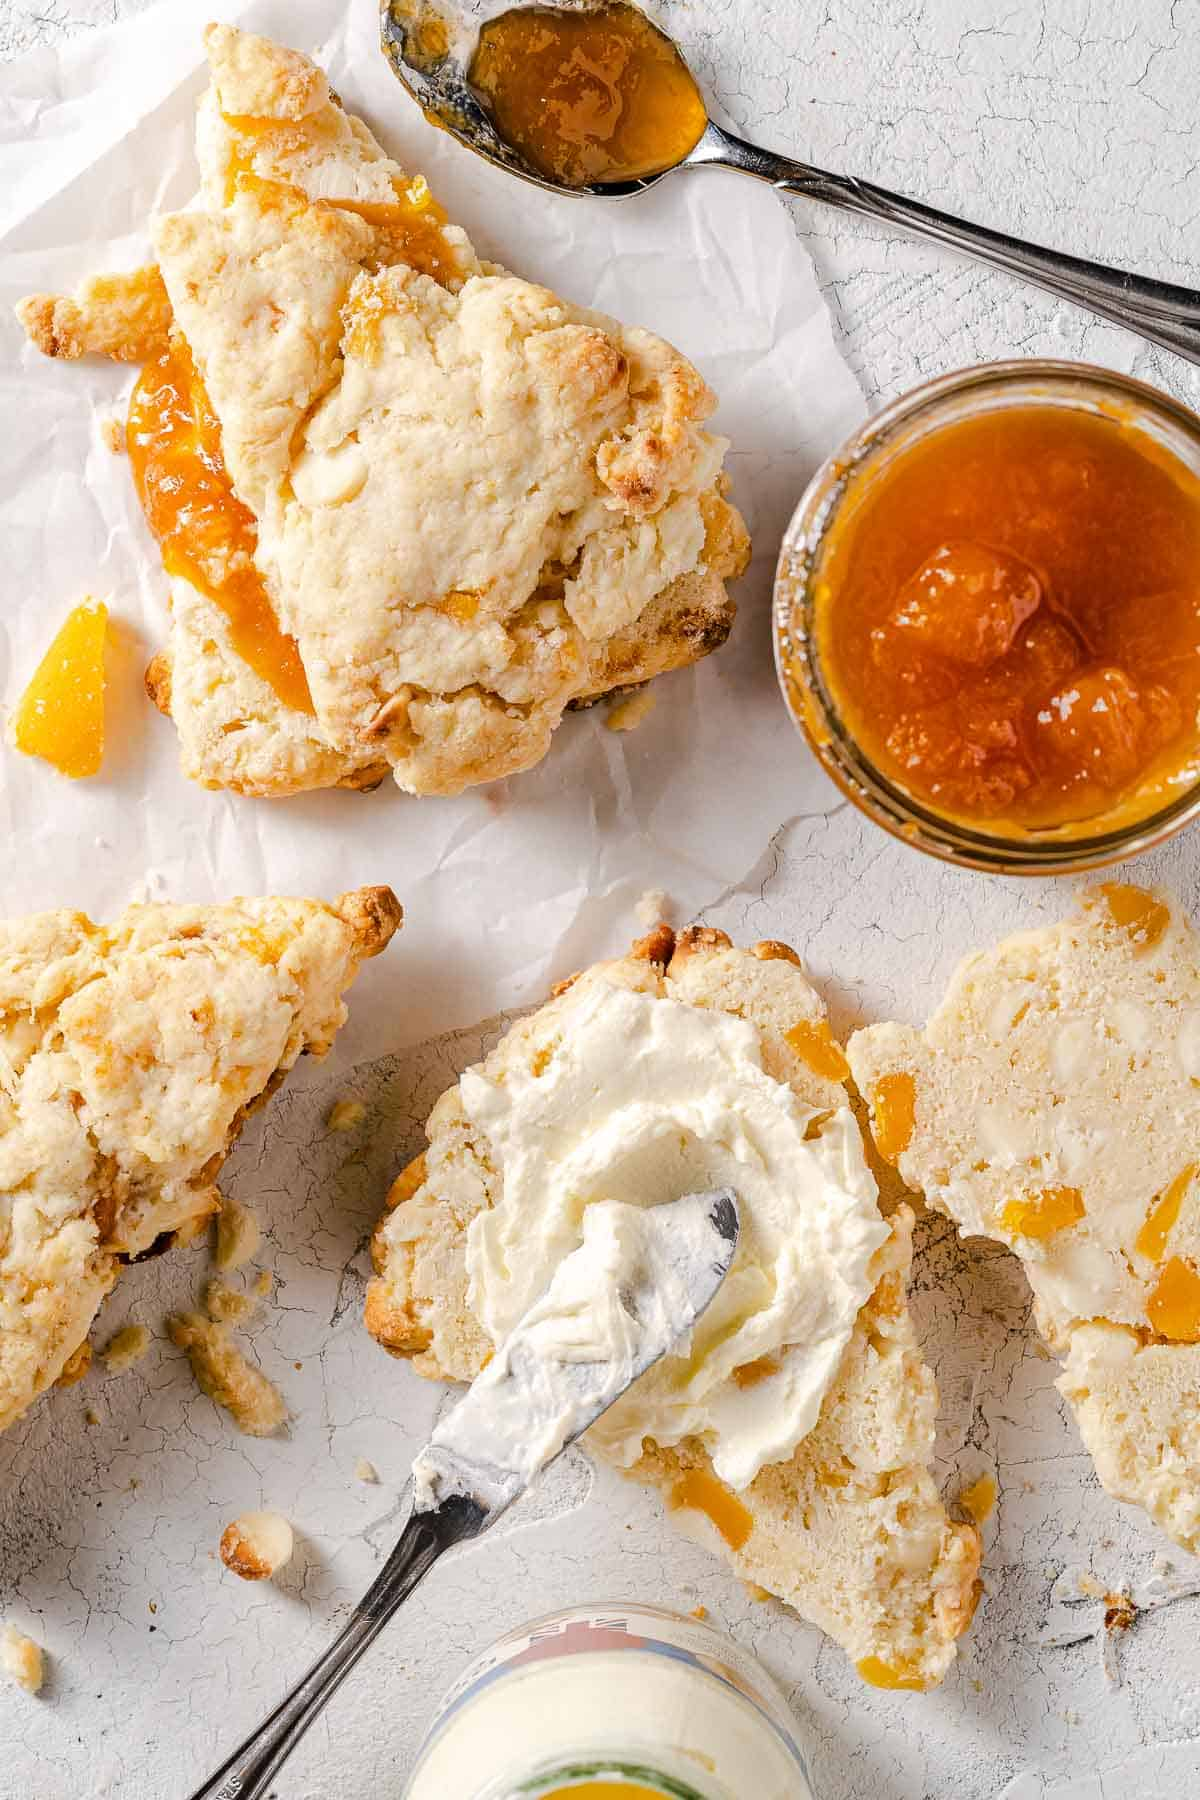 mango white chocolate scones with jam and cream